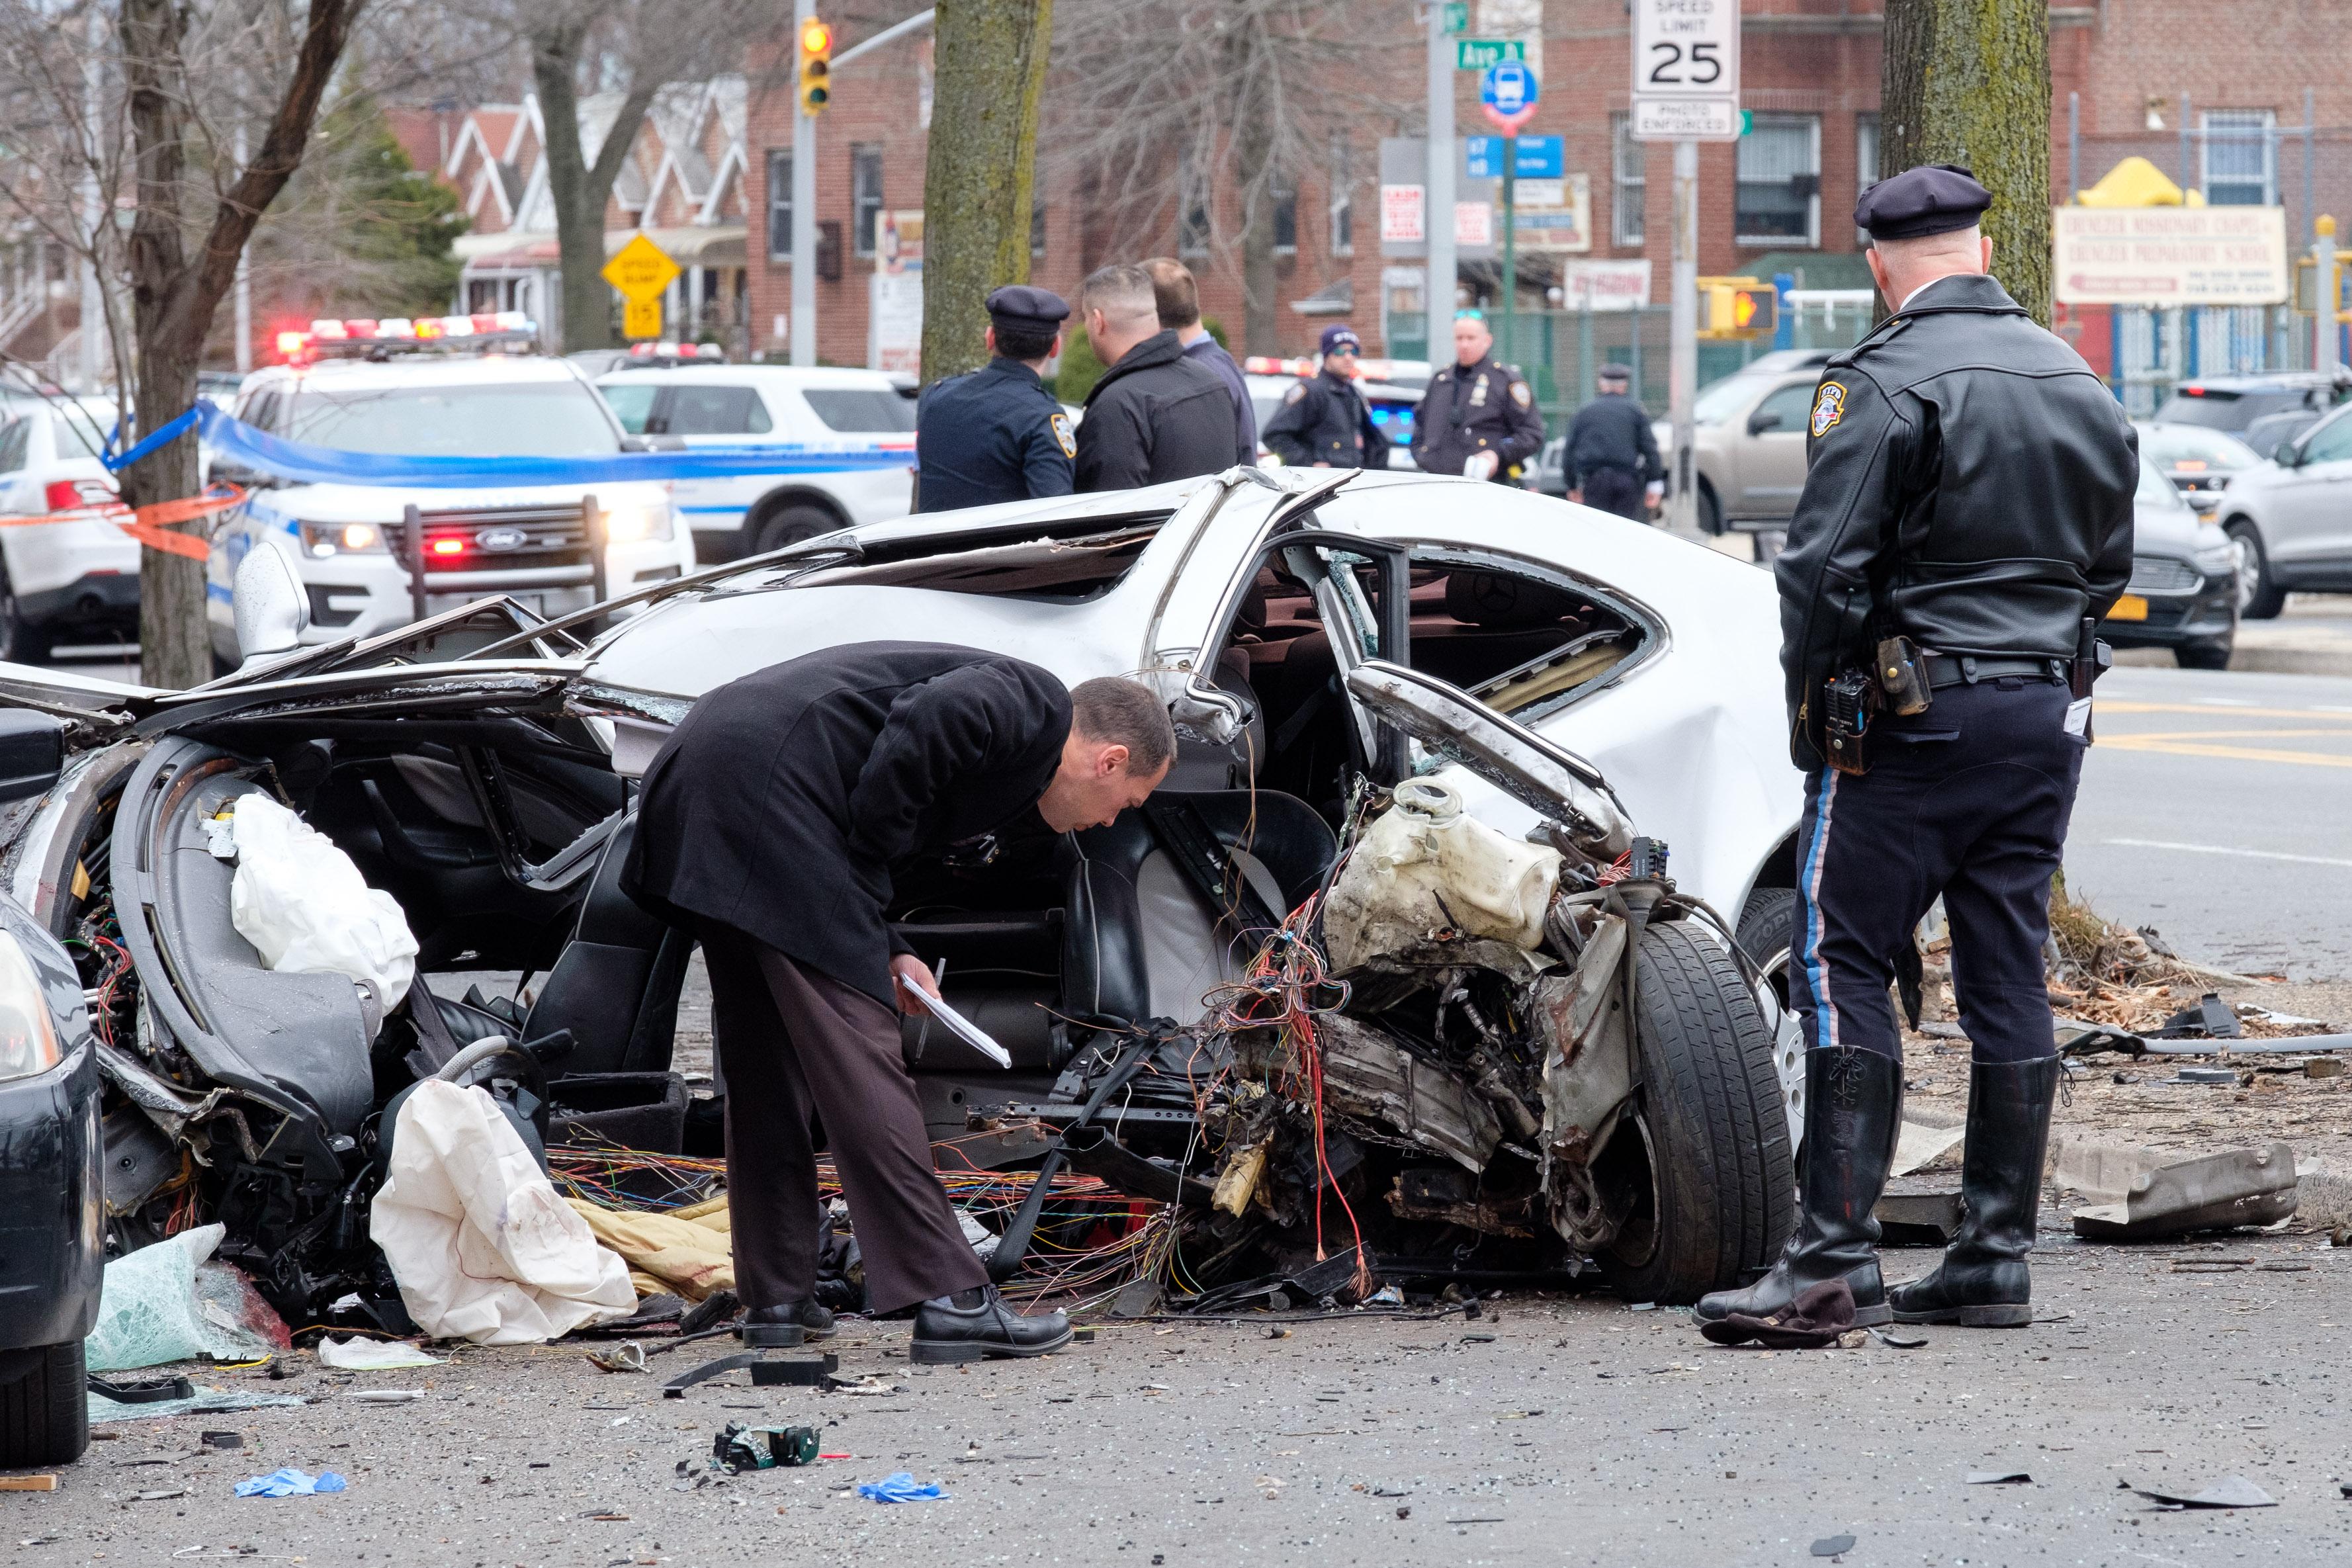 Brooklyn car crash kills 19-year-old, two other teens injured: cops